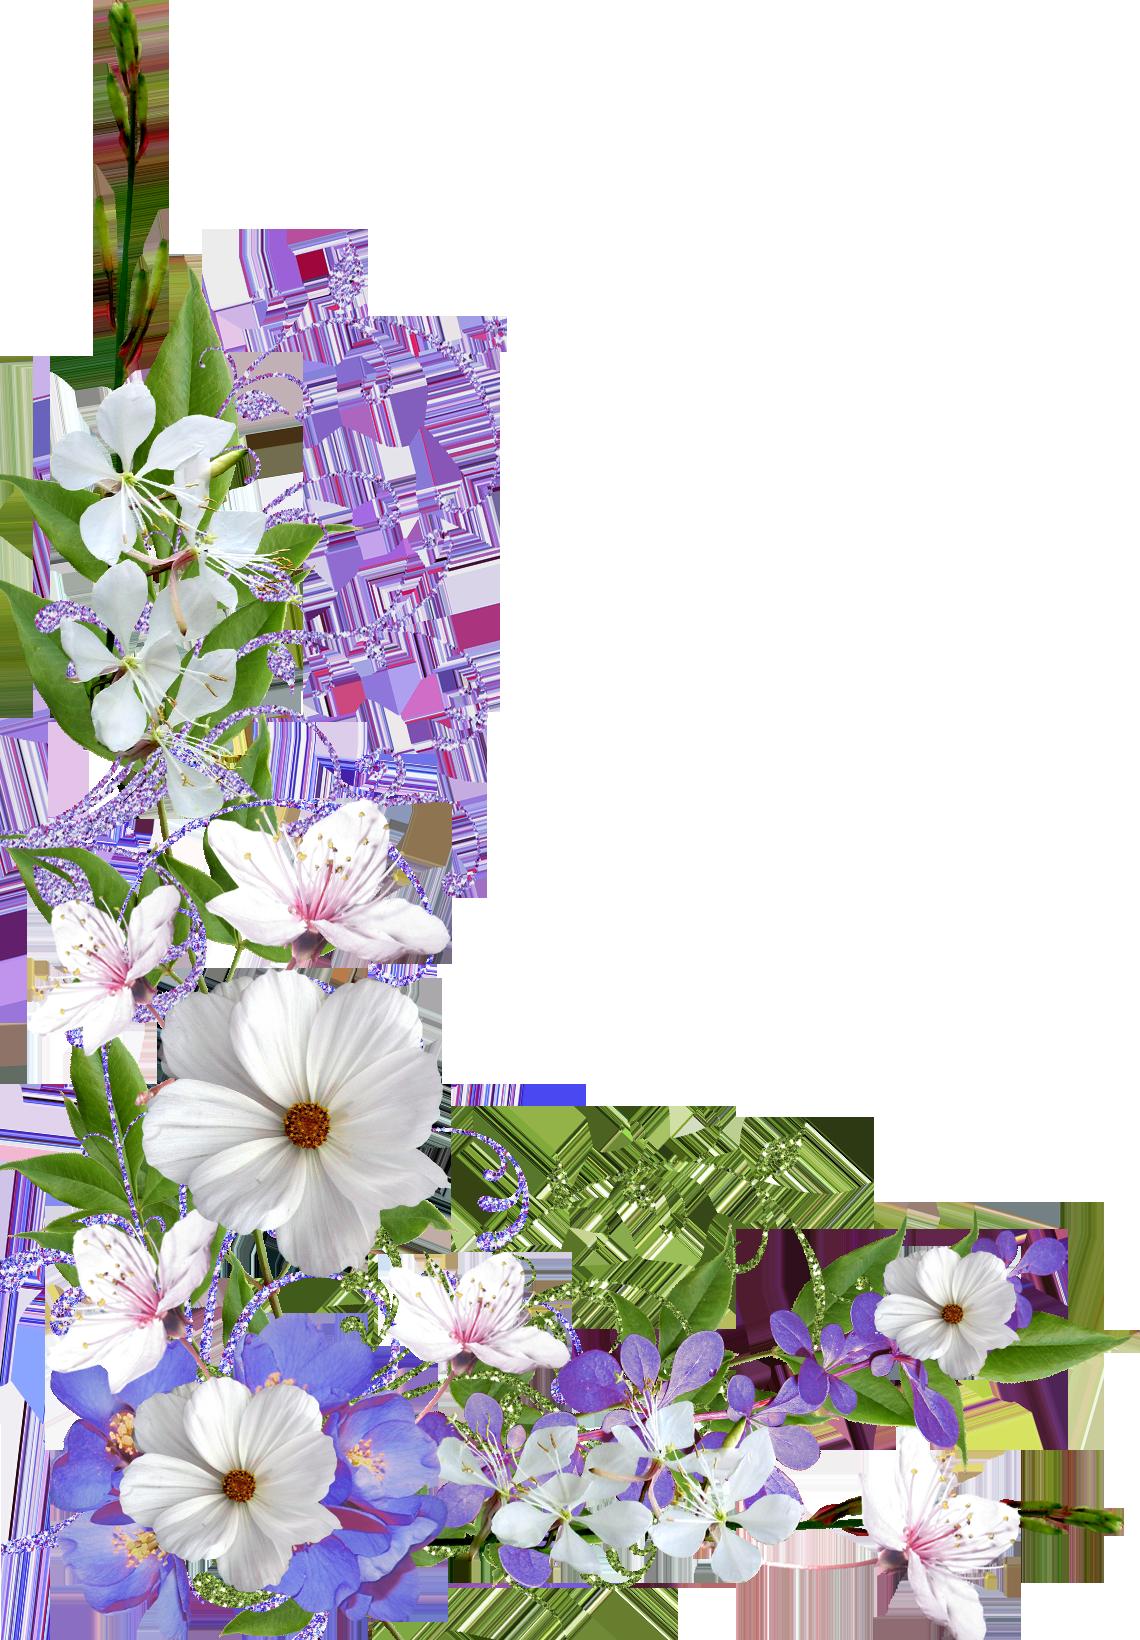 Pin By Bonnie Jones On Fun Stuff To Do Flower Frame Flower Decorations Flower Wallpaper